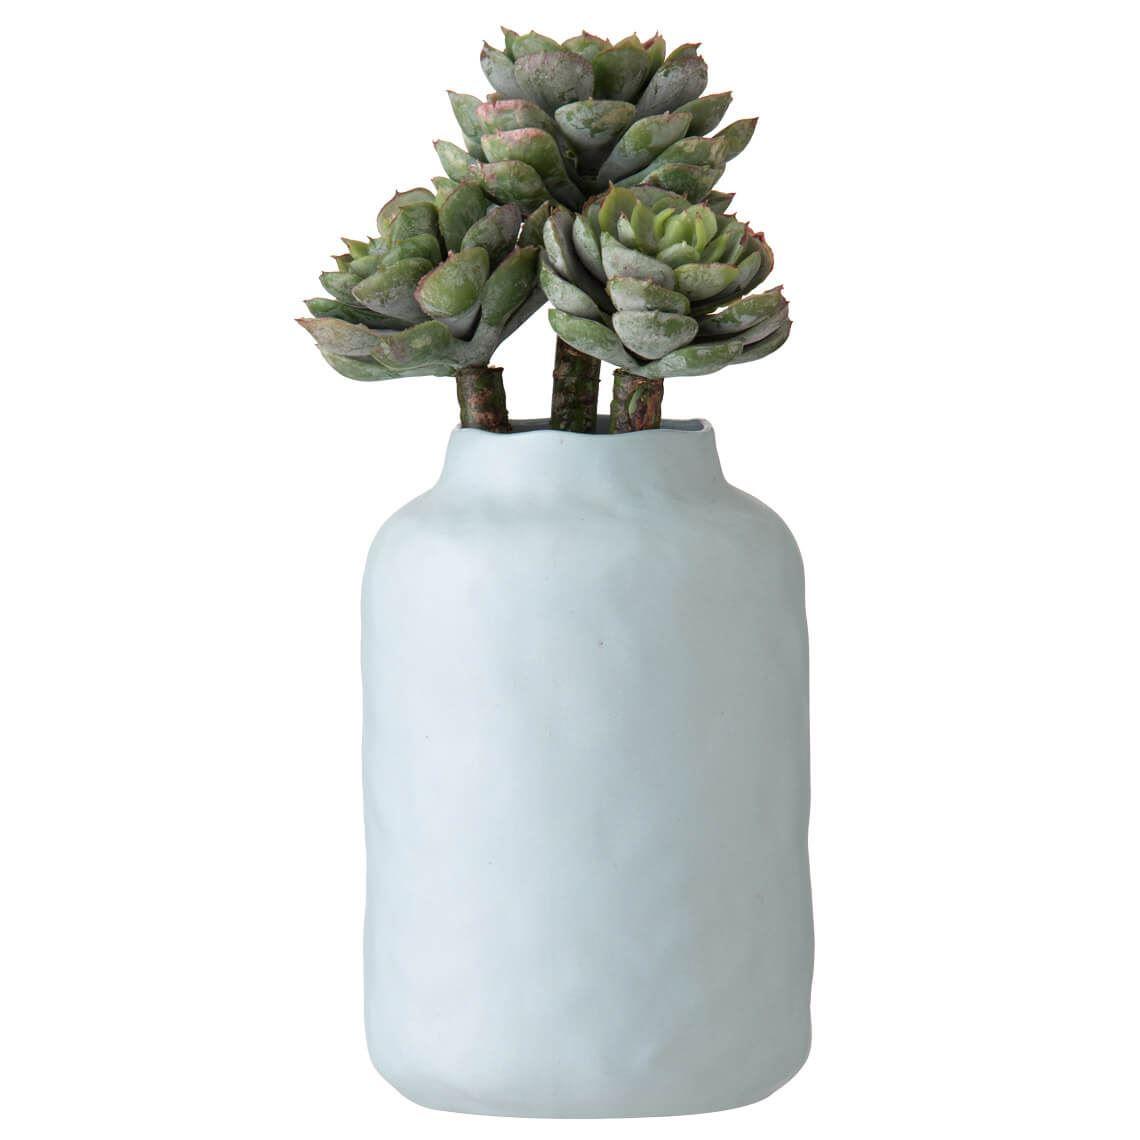 Pinecone Echeveria Kesia Vase Size W 12cm x D 10cm x H 23cm in Blue Freedom